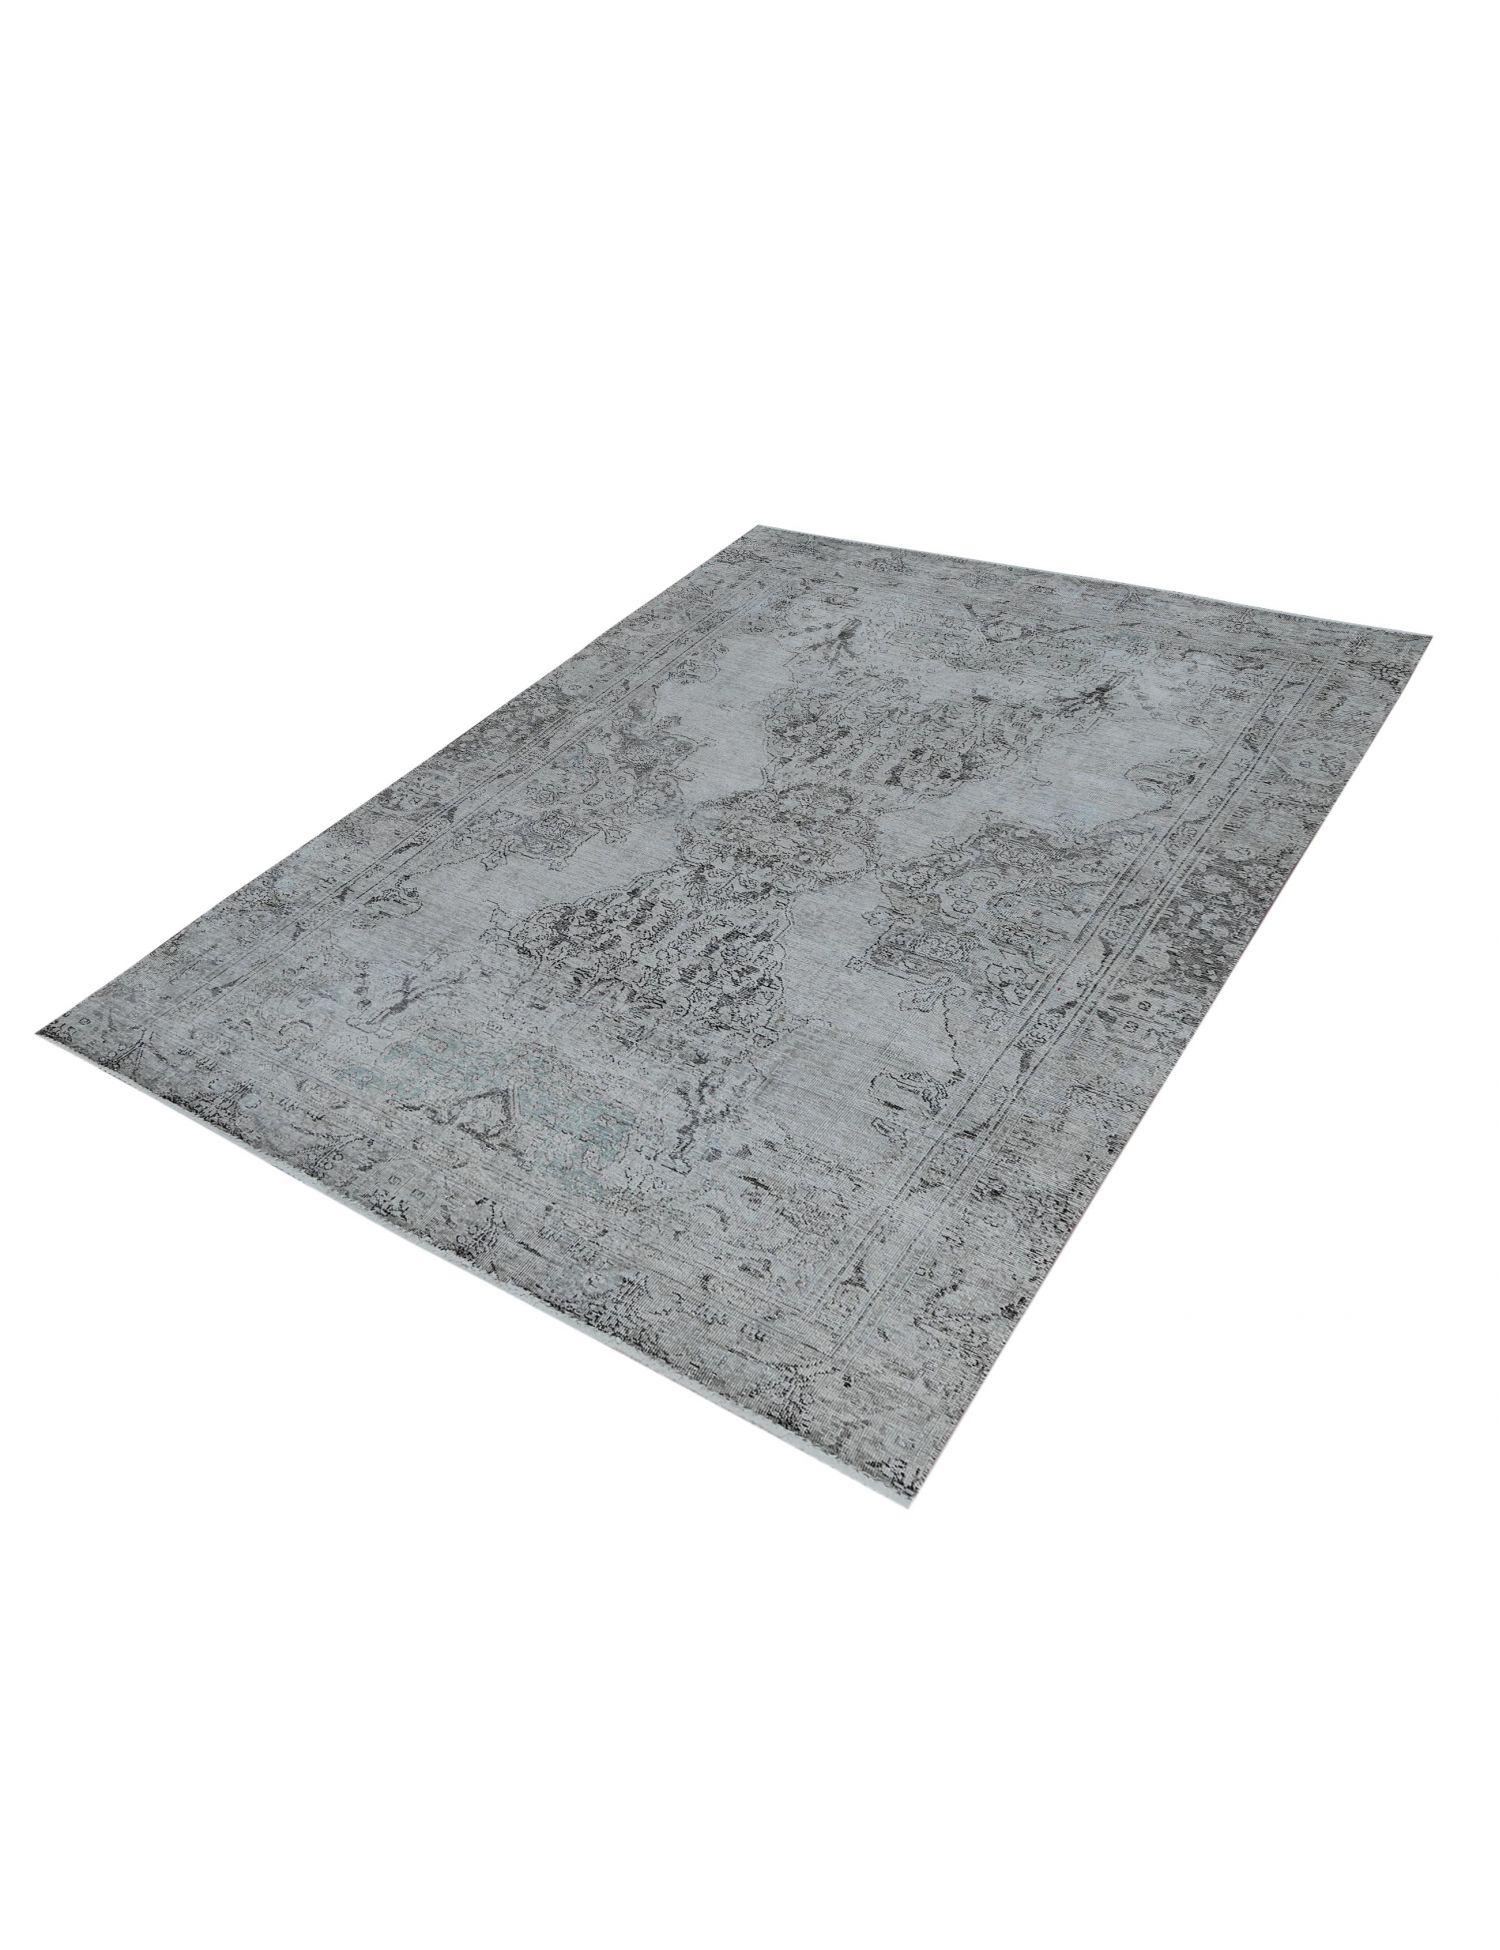 Vintage Teppich  grau <br/>279 x 173 cm